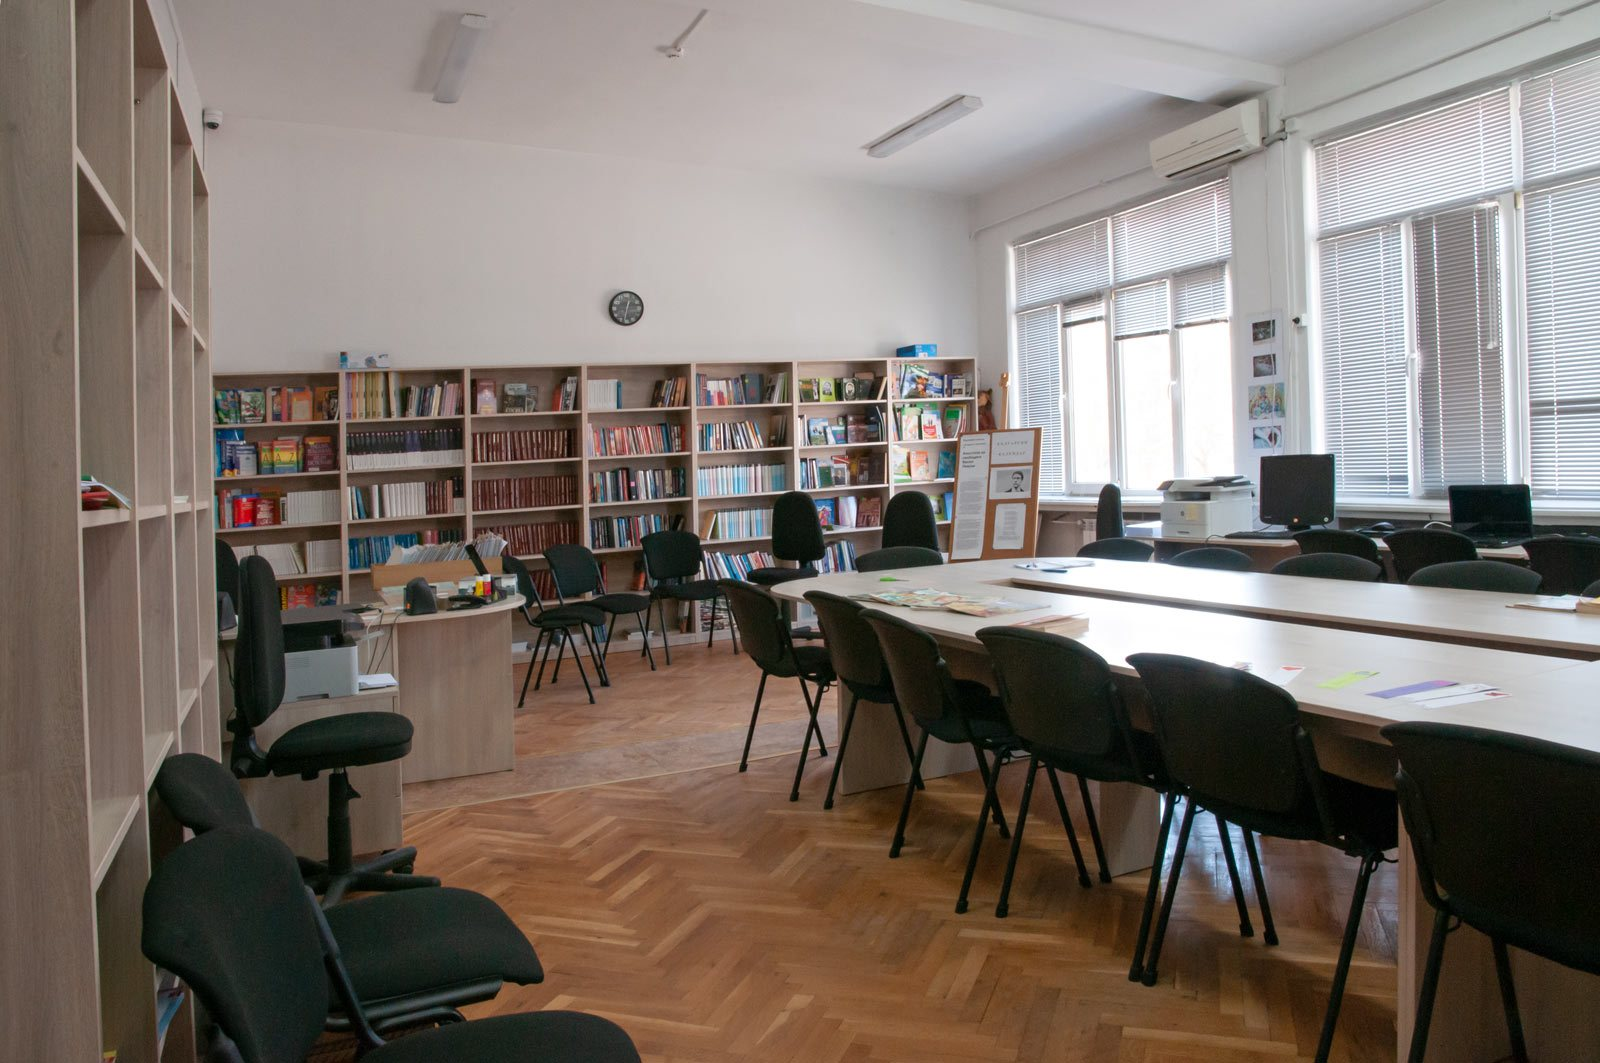 EZF1415-library-1